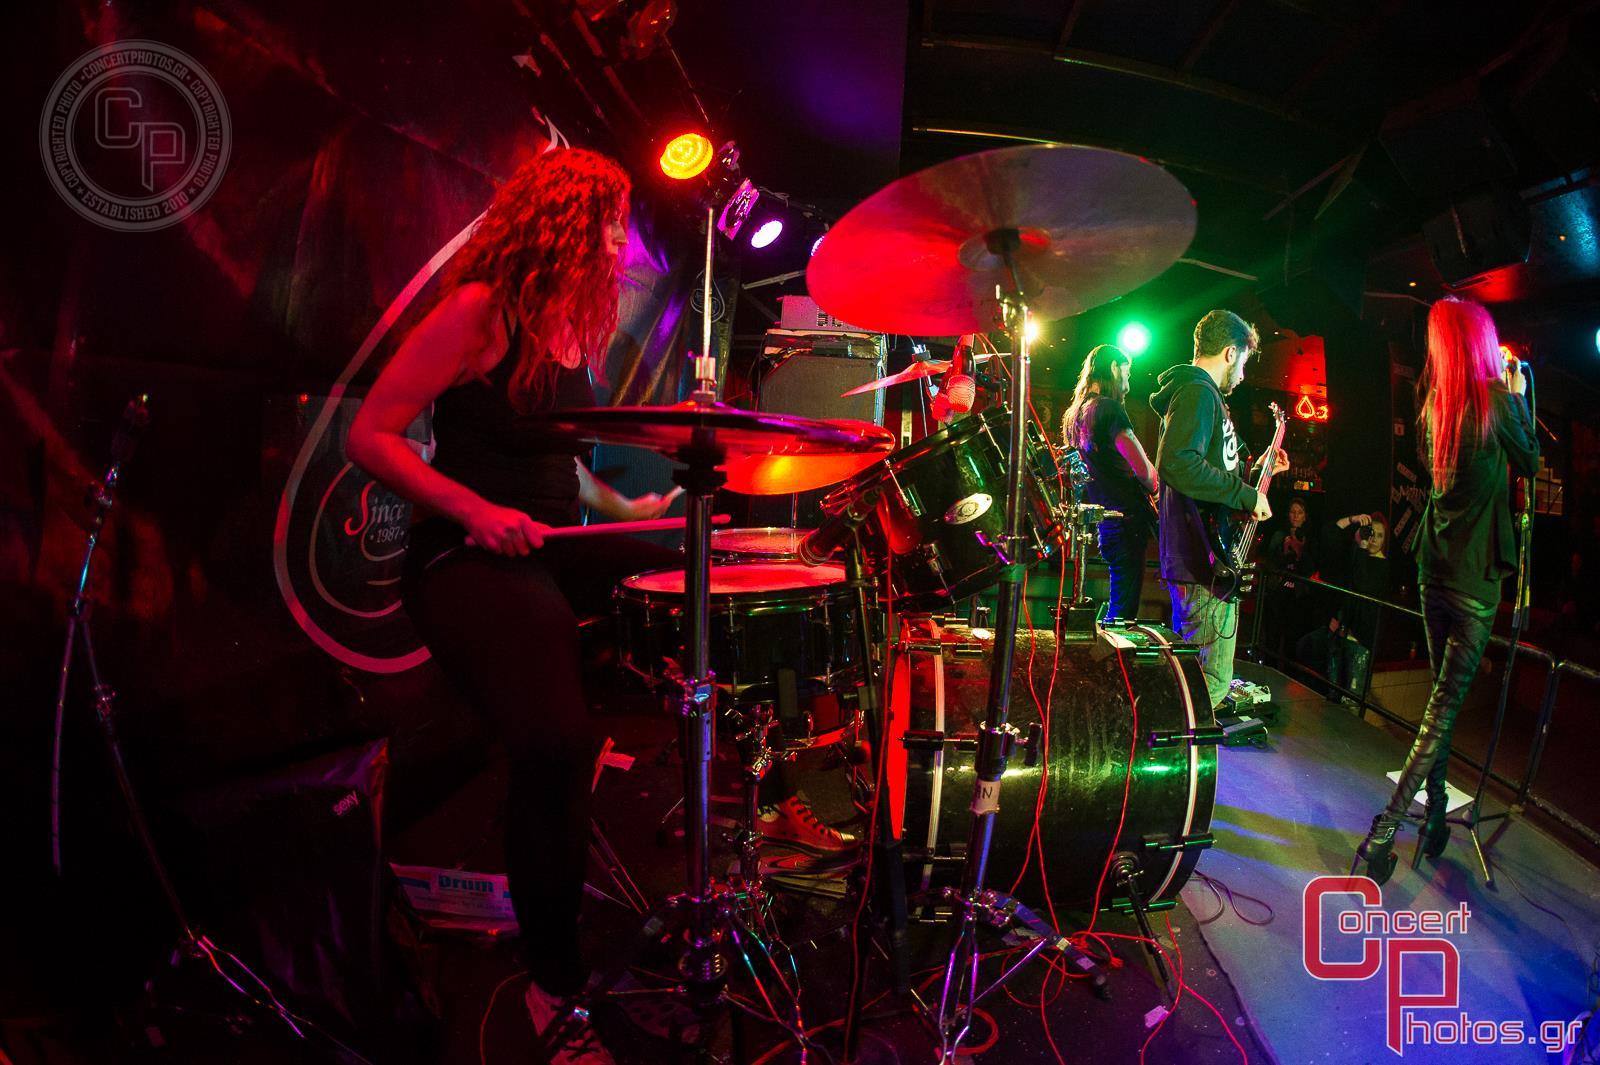 Battle Of The Bands Leg 1-Battle Of The Bands Leg 1 photographer:  - ConcertPhotos - 20141127_0013_26